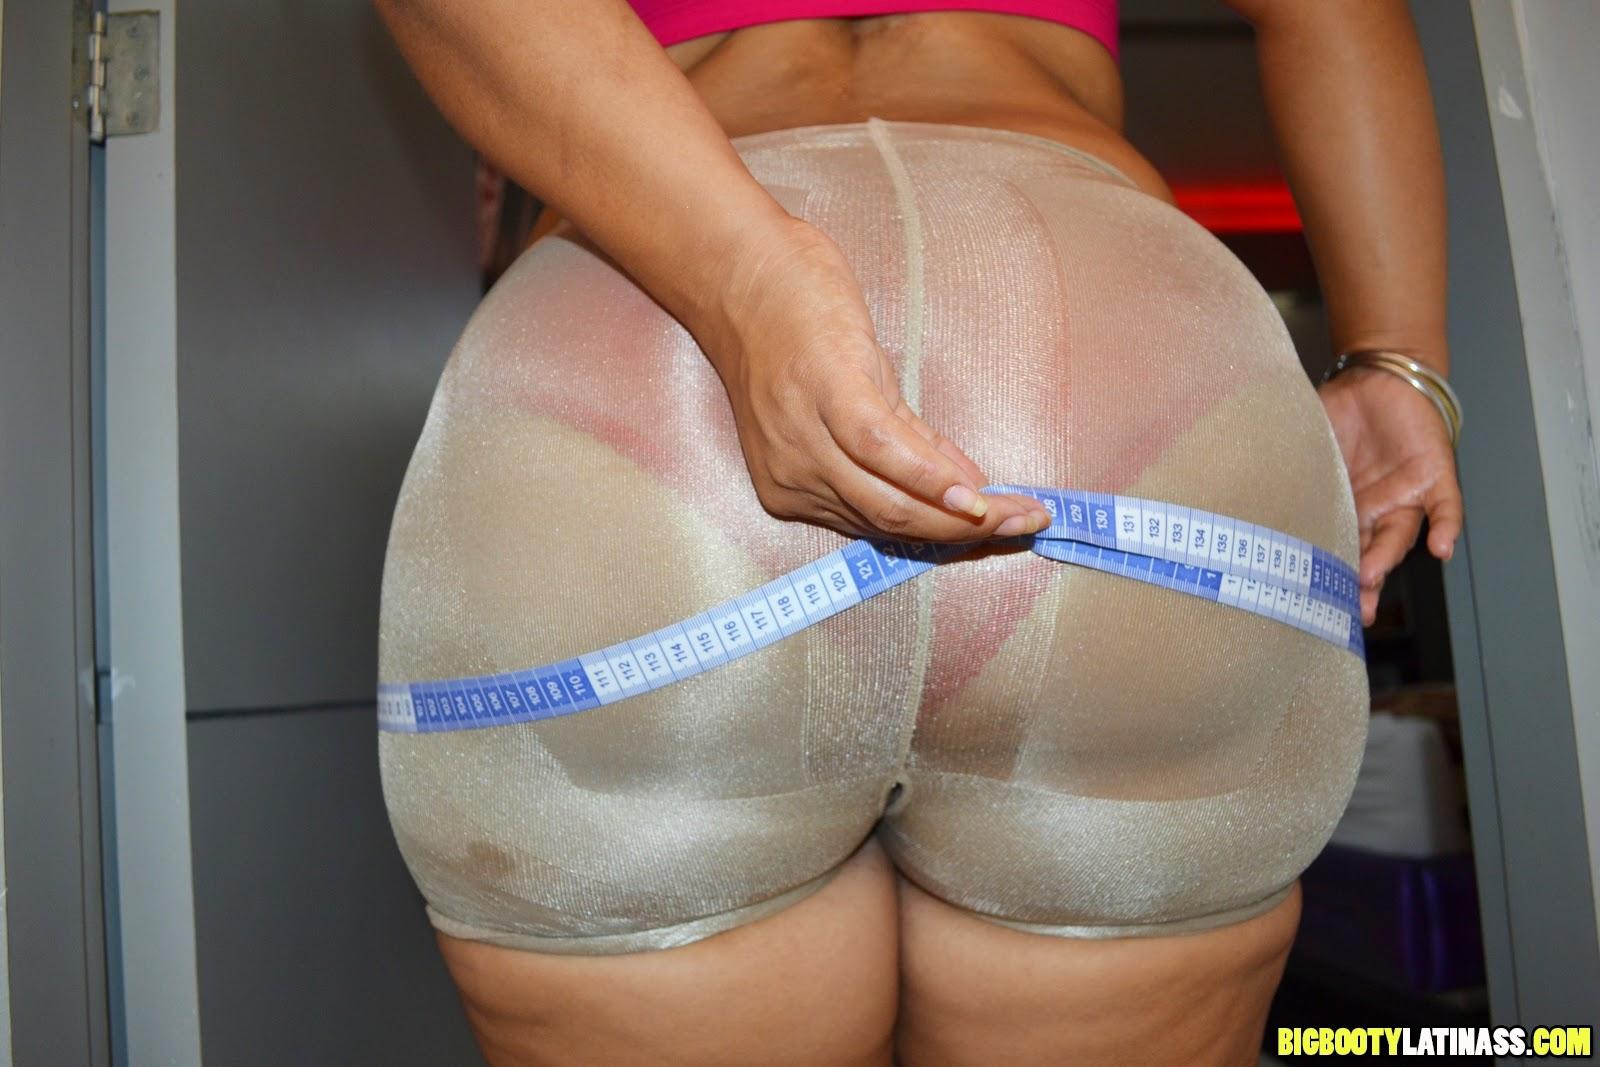 big booty latinas luciana assoholics